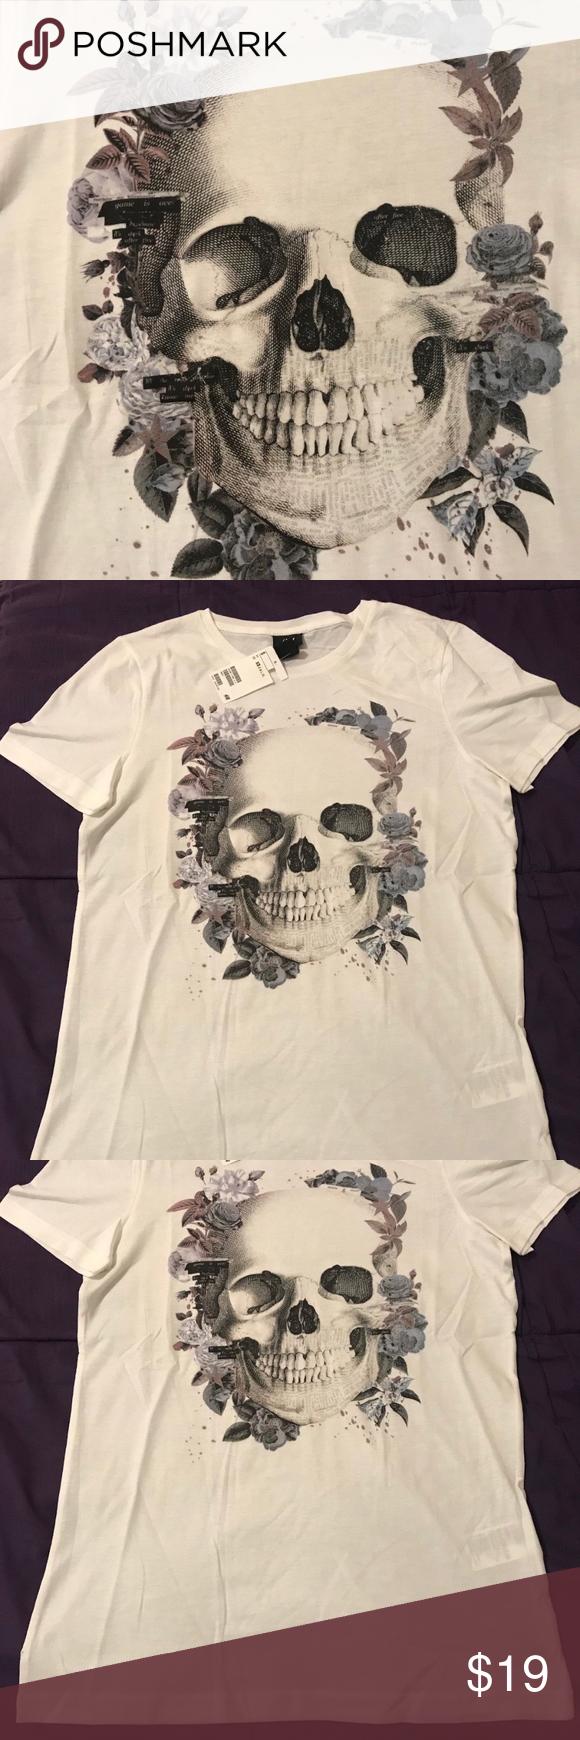 Skull Roses H M T Shirt Size Xs Skull Skulls And Roses Clothes Design